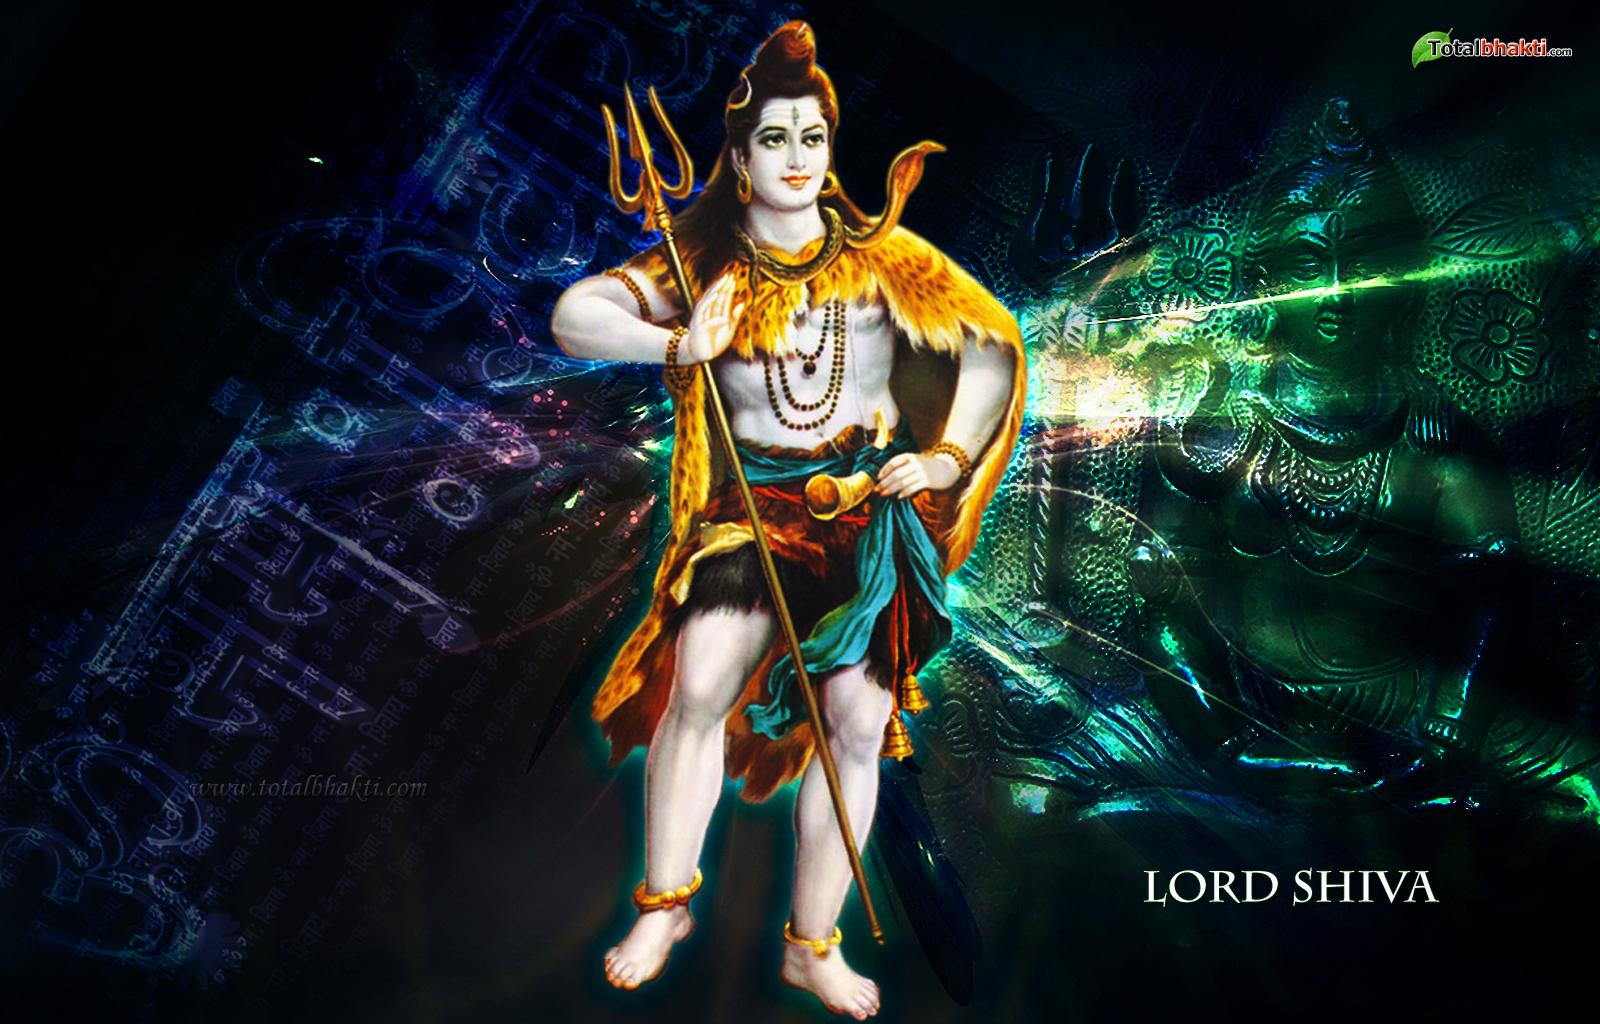 161183-lord-shiva-wallpaper-dark-green-color-with-lord-shiva.jpg